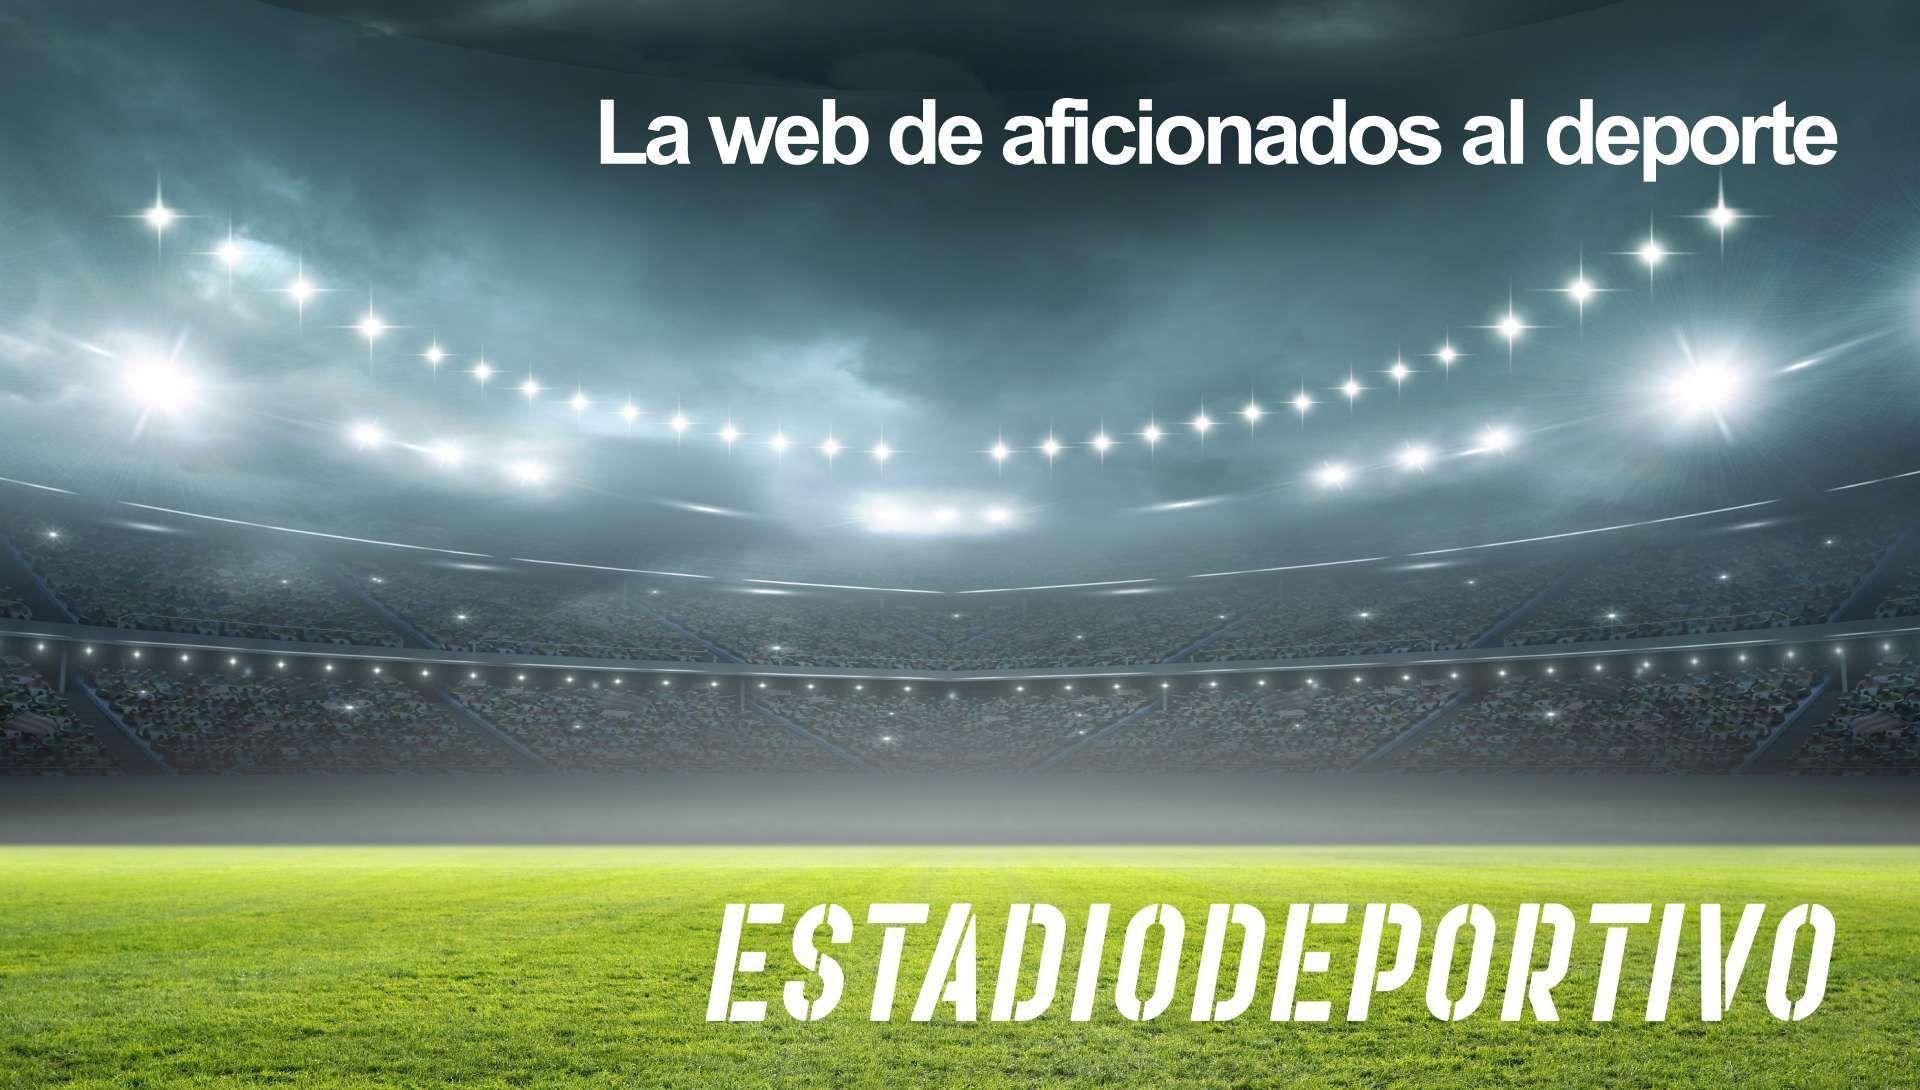 Junta General de Accionistas del Sevilla FC 2017